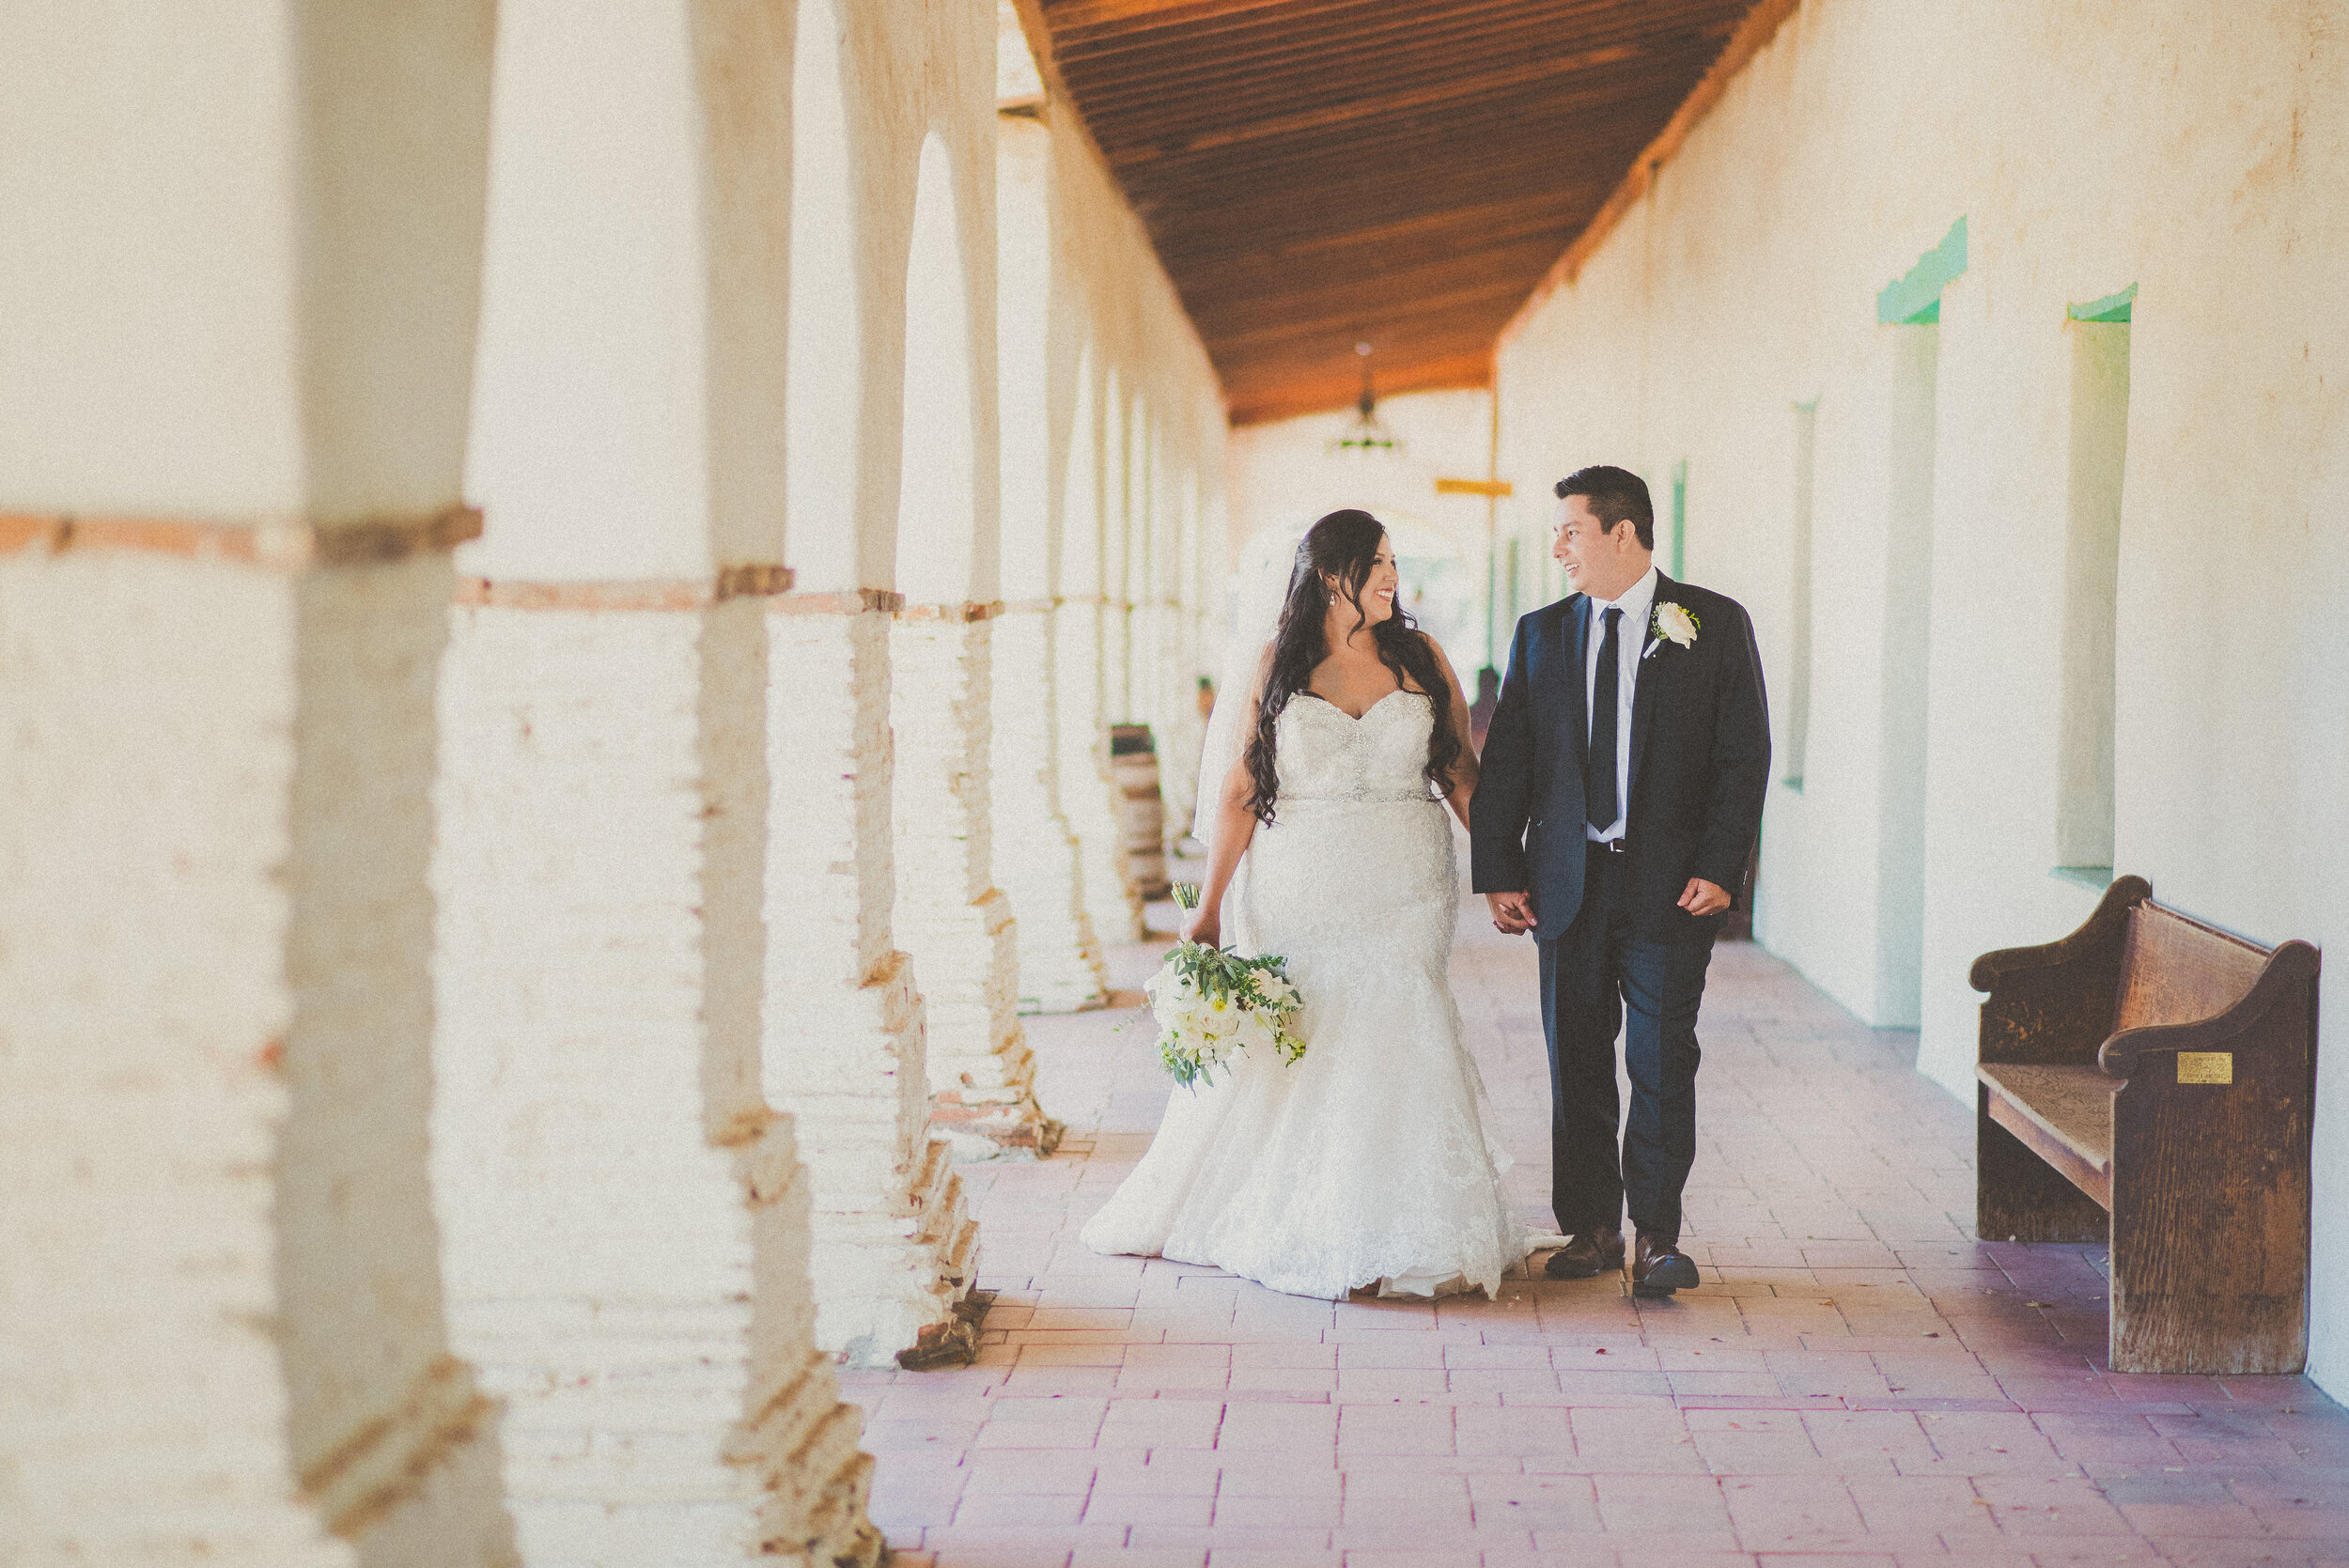 Herrera Wedding - Bride & Groom Portraits-18.jpg